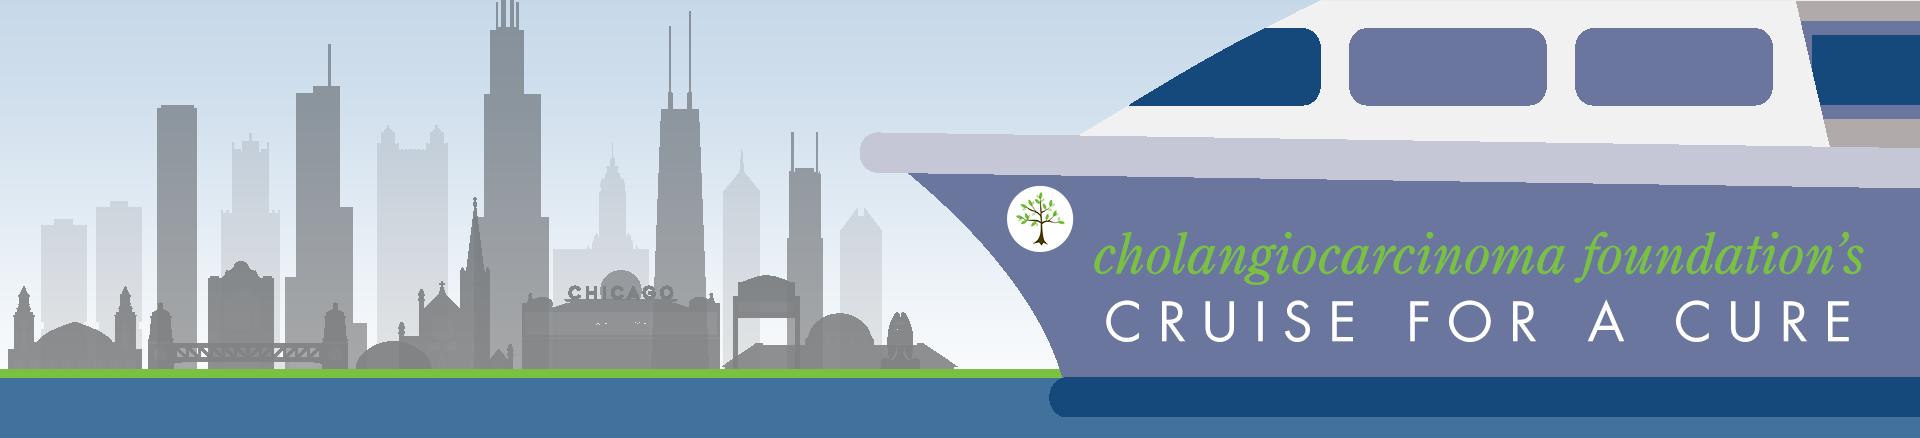 cruise-header